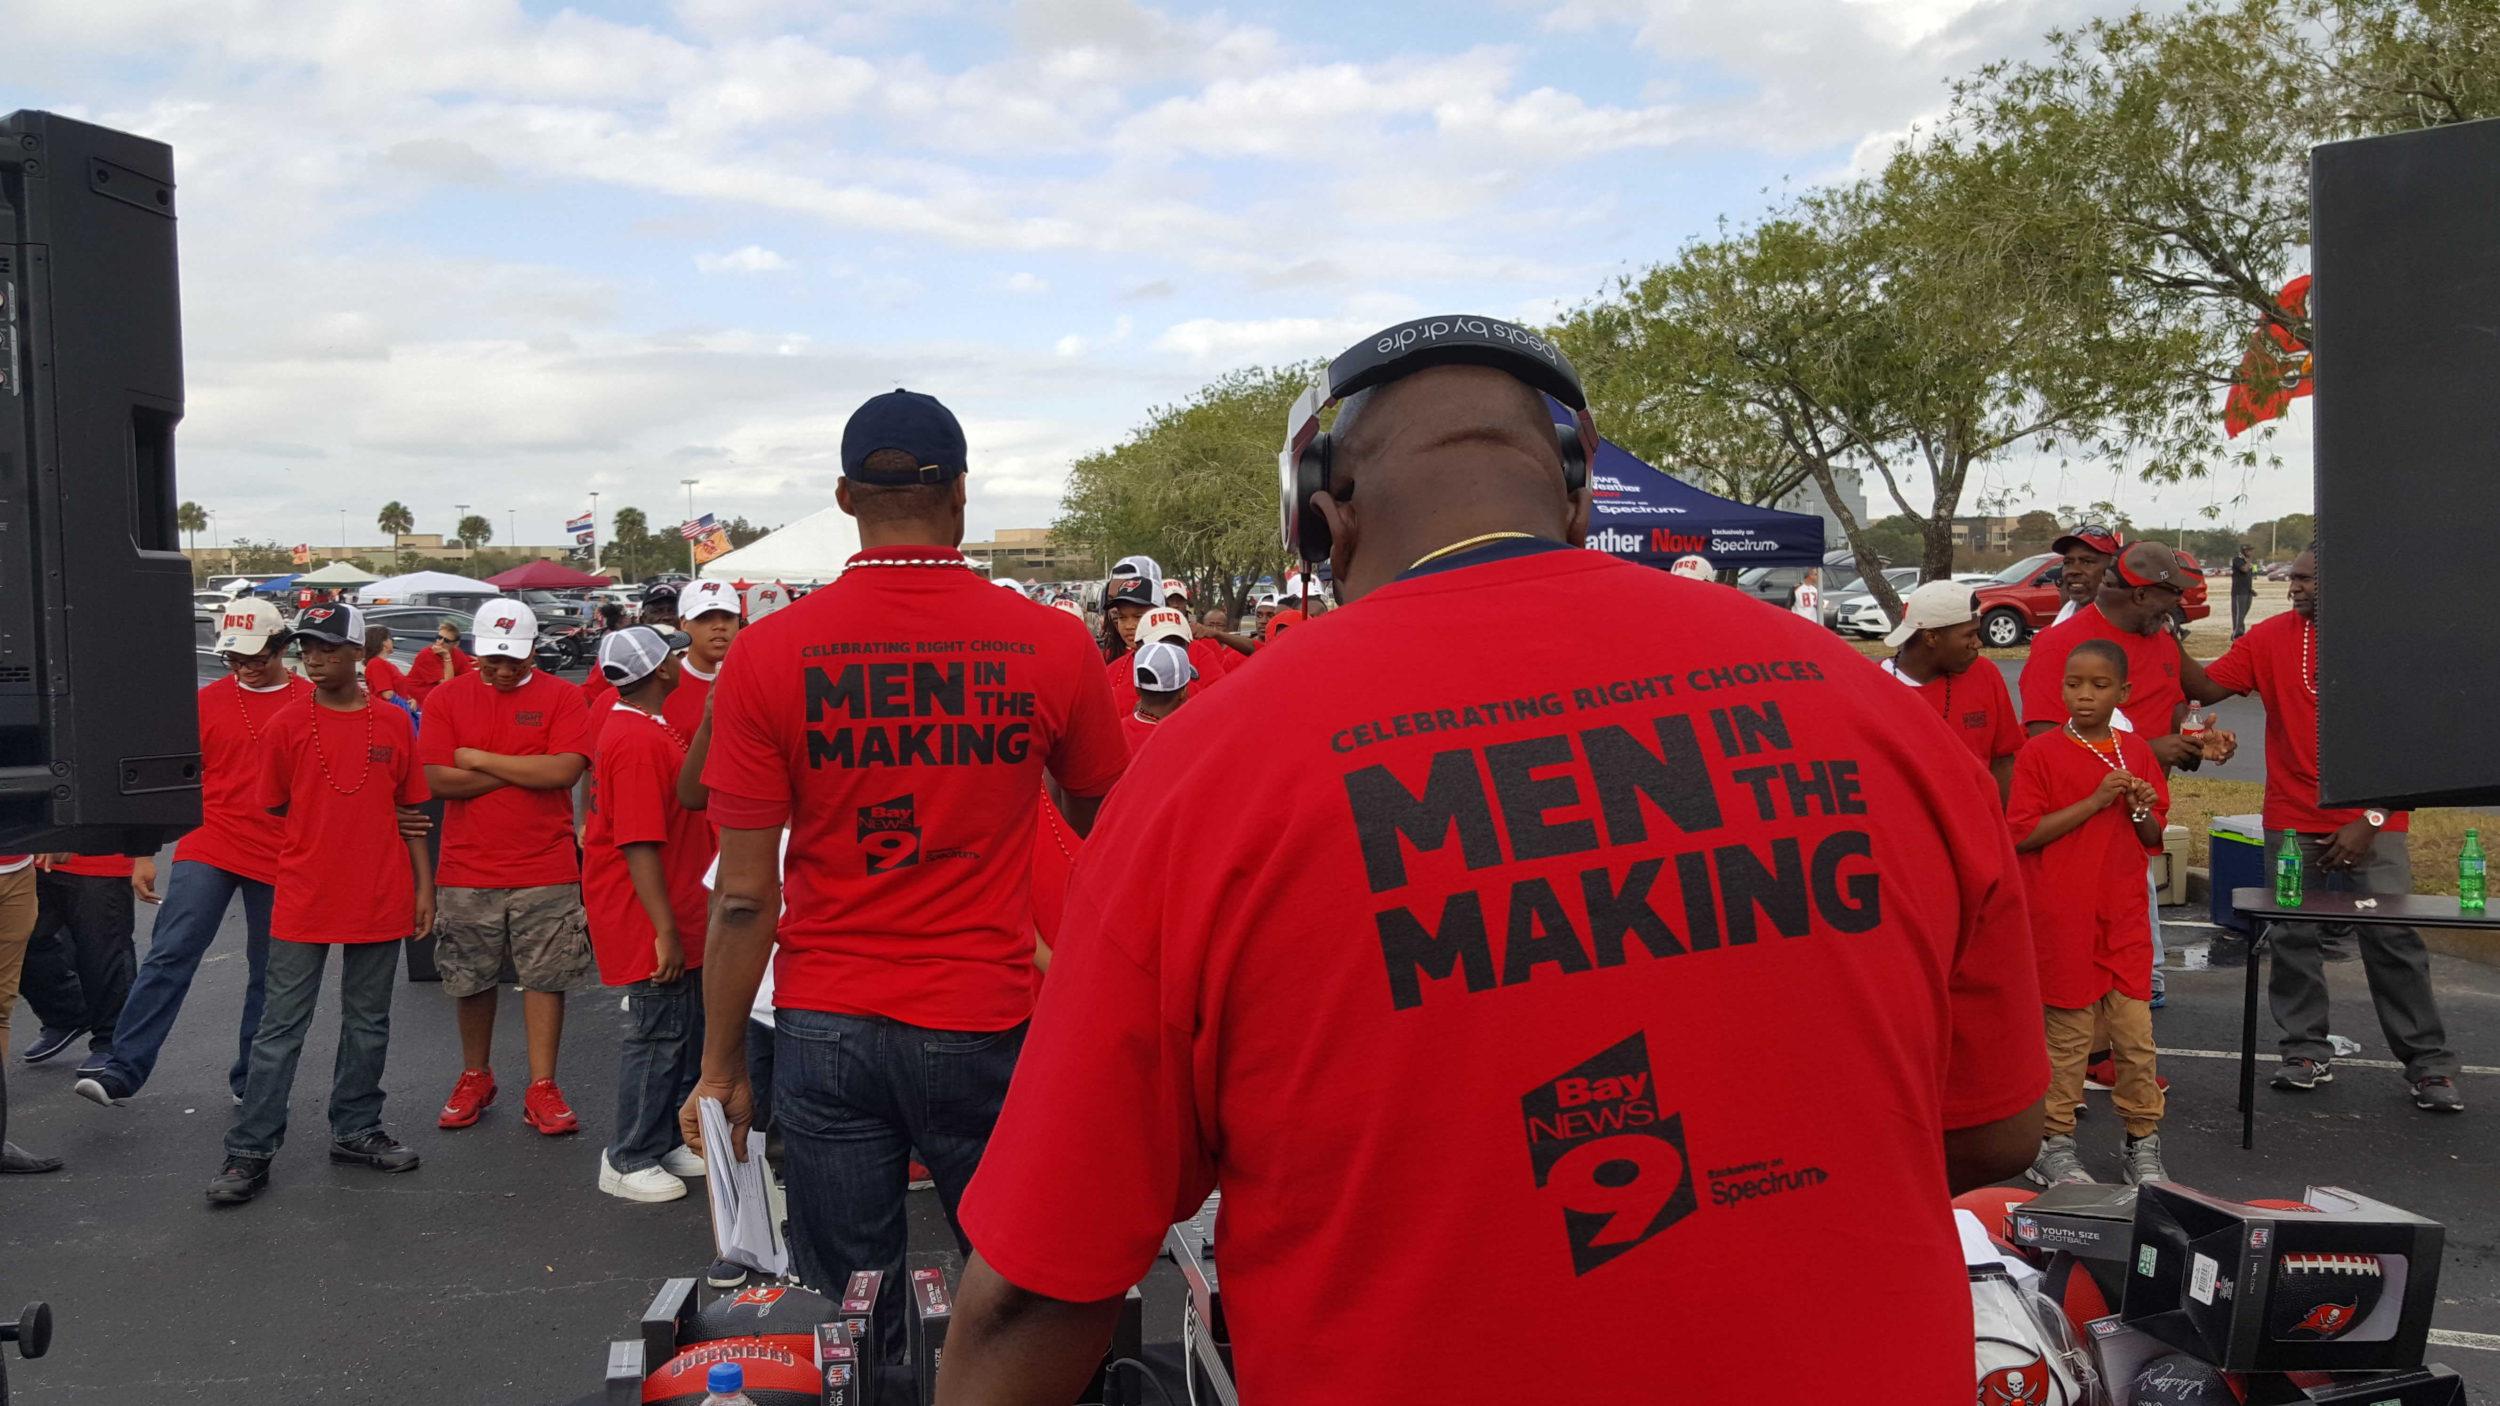 Men In The Making